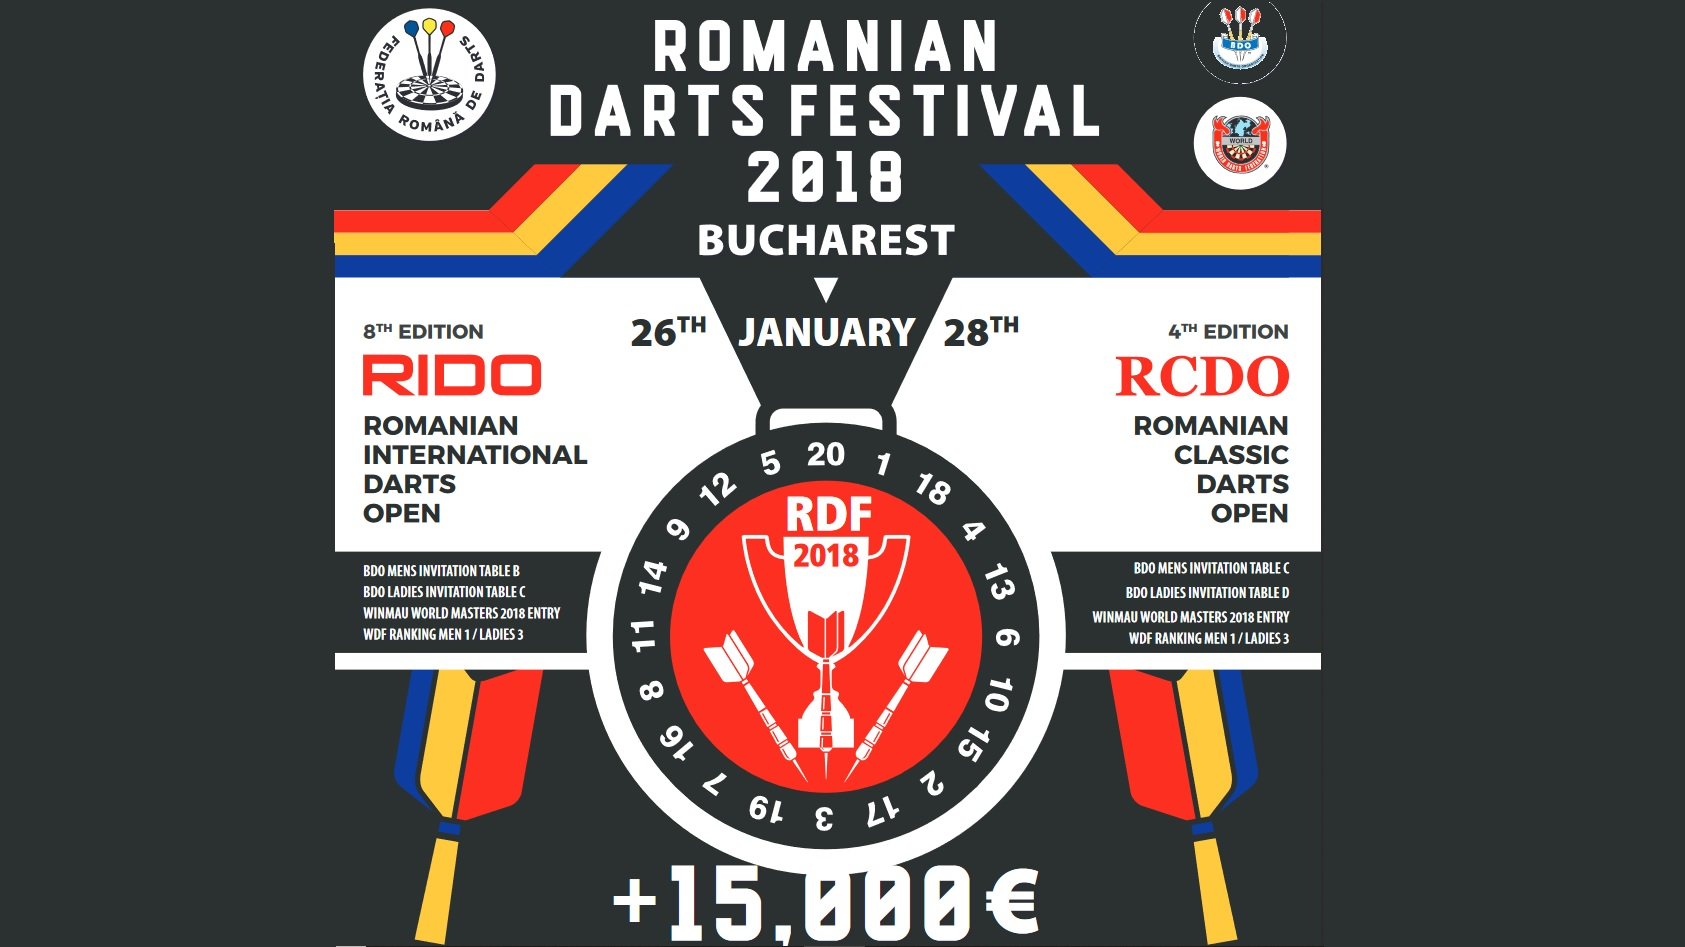 Romanian Darts Festival 2019